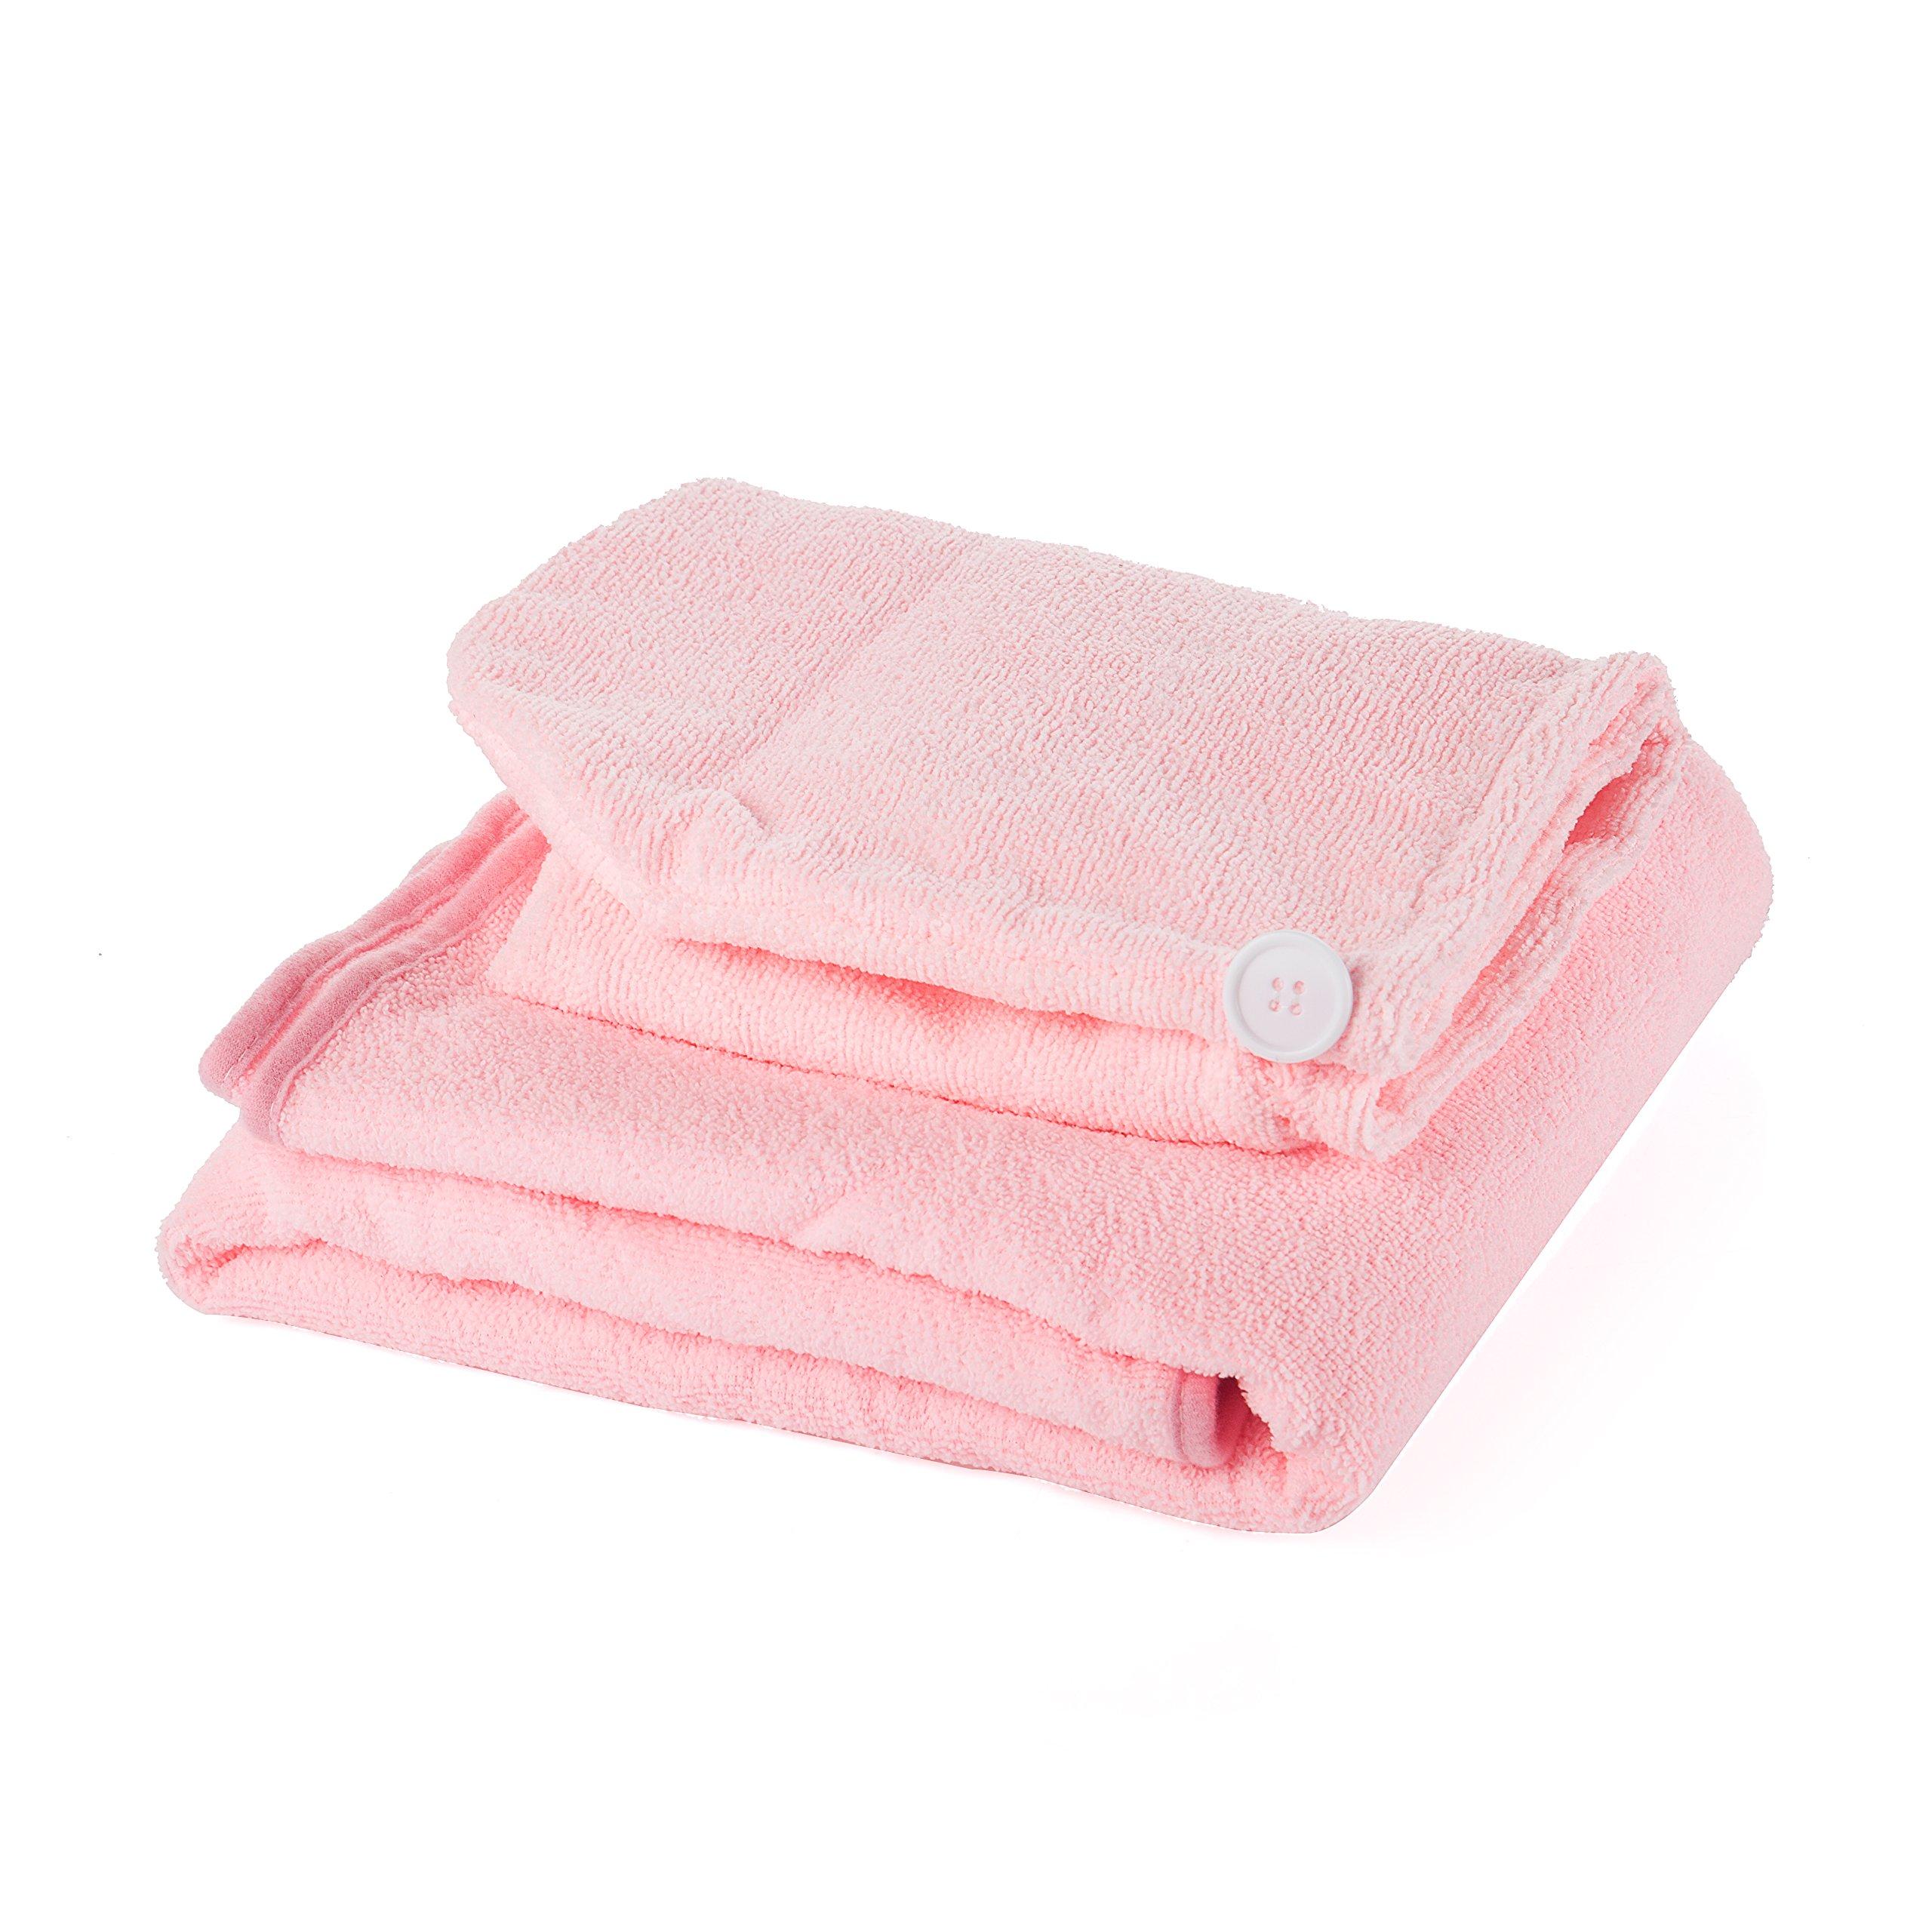 Wearable Towel Magic Bath with BathCap Towels Bath Skirt Lady Girls Wearable Sexy Soft Fast Drying Magic Sauna Spa Beach Swim Bath Towel Bathrobe Wrap (pink)